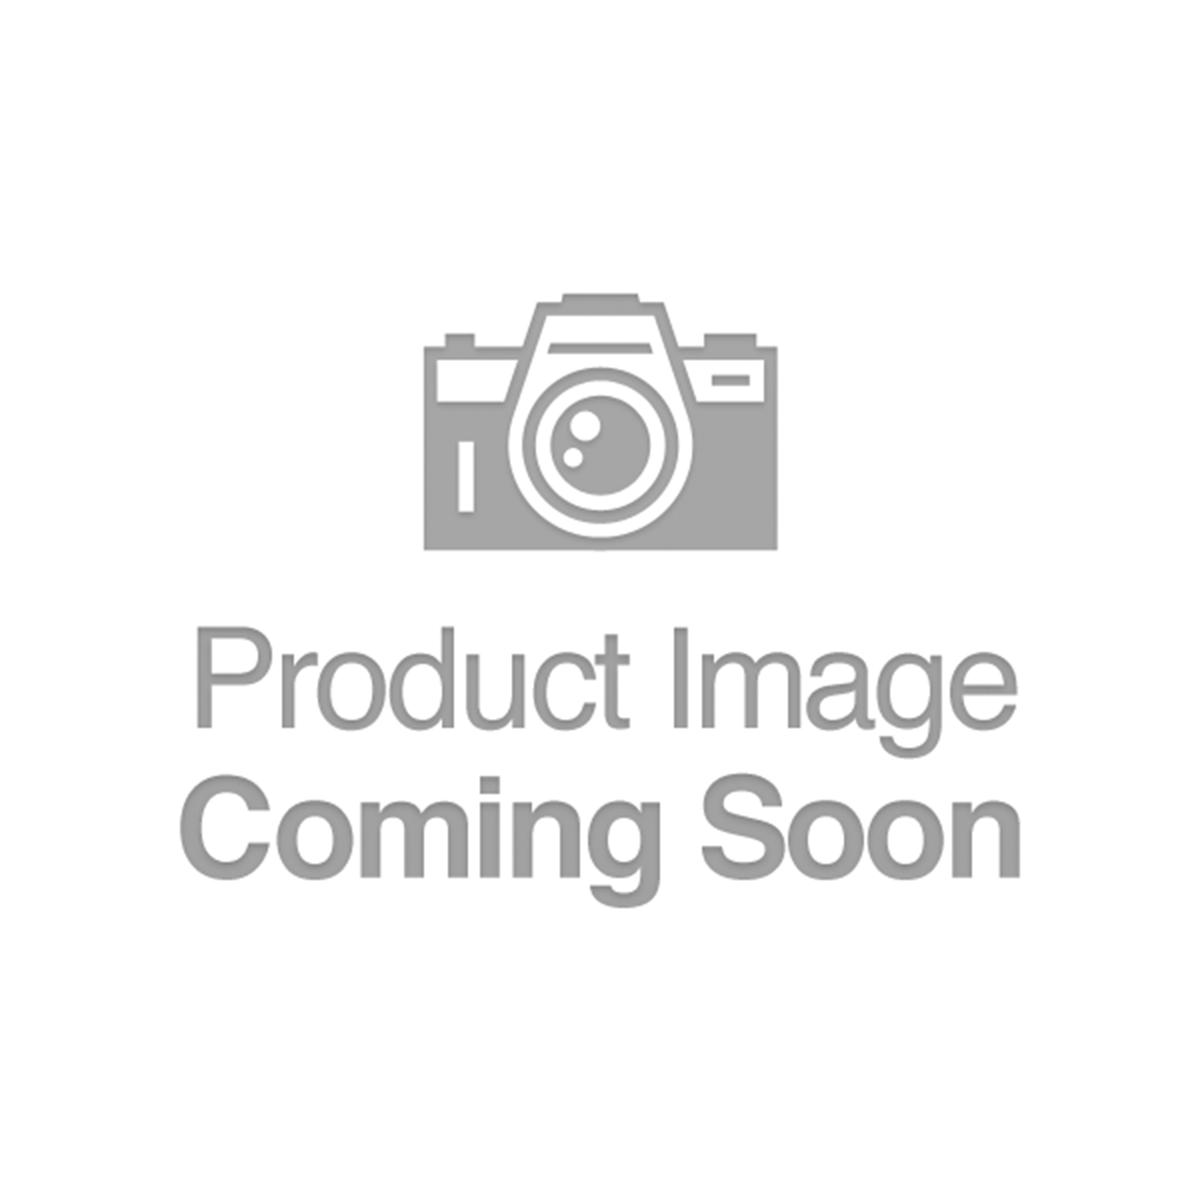 Corsicana - Texas - CH 11022 - FR 682 - PMG 30